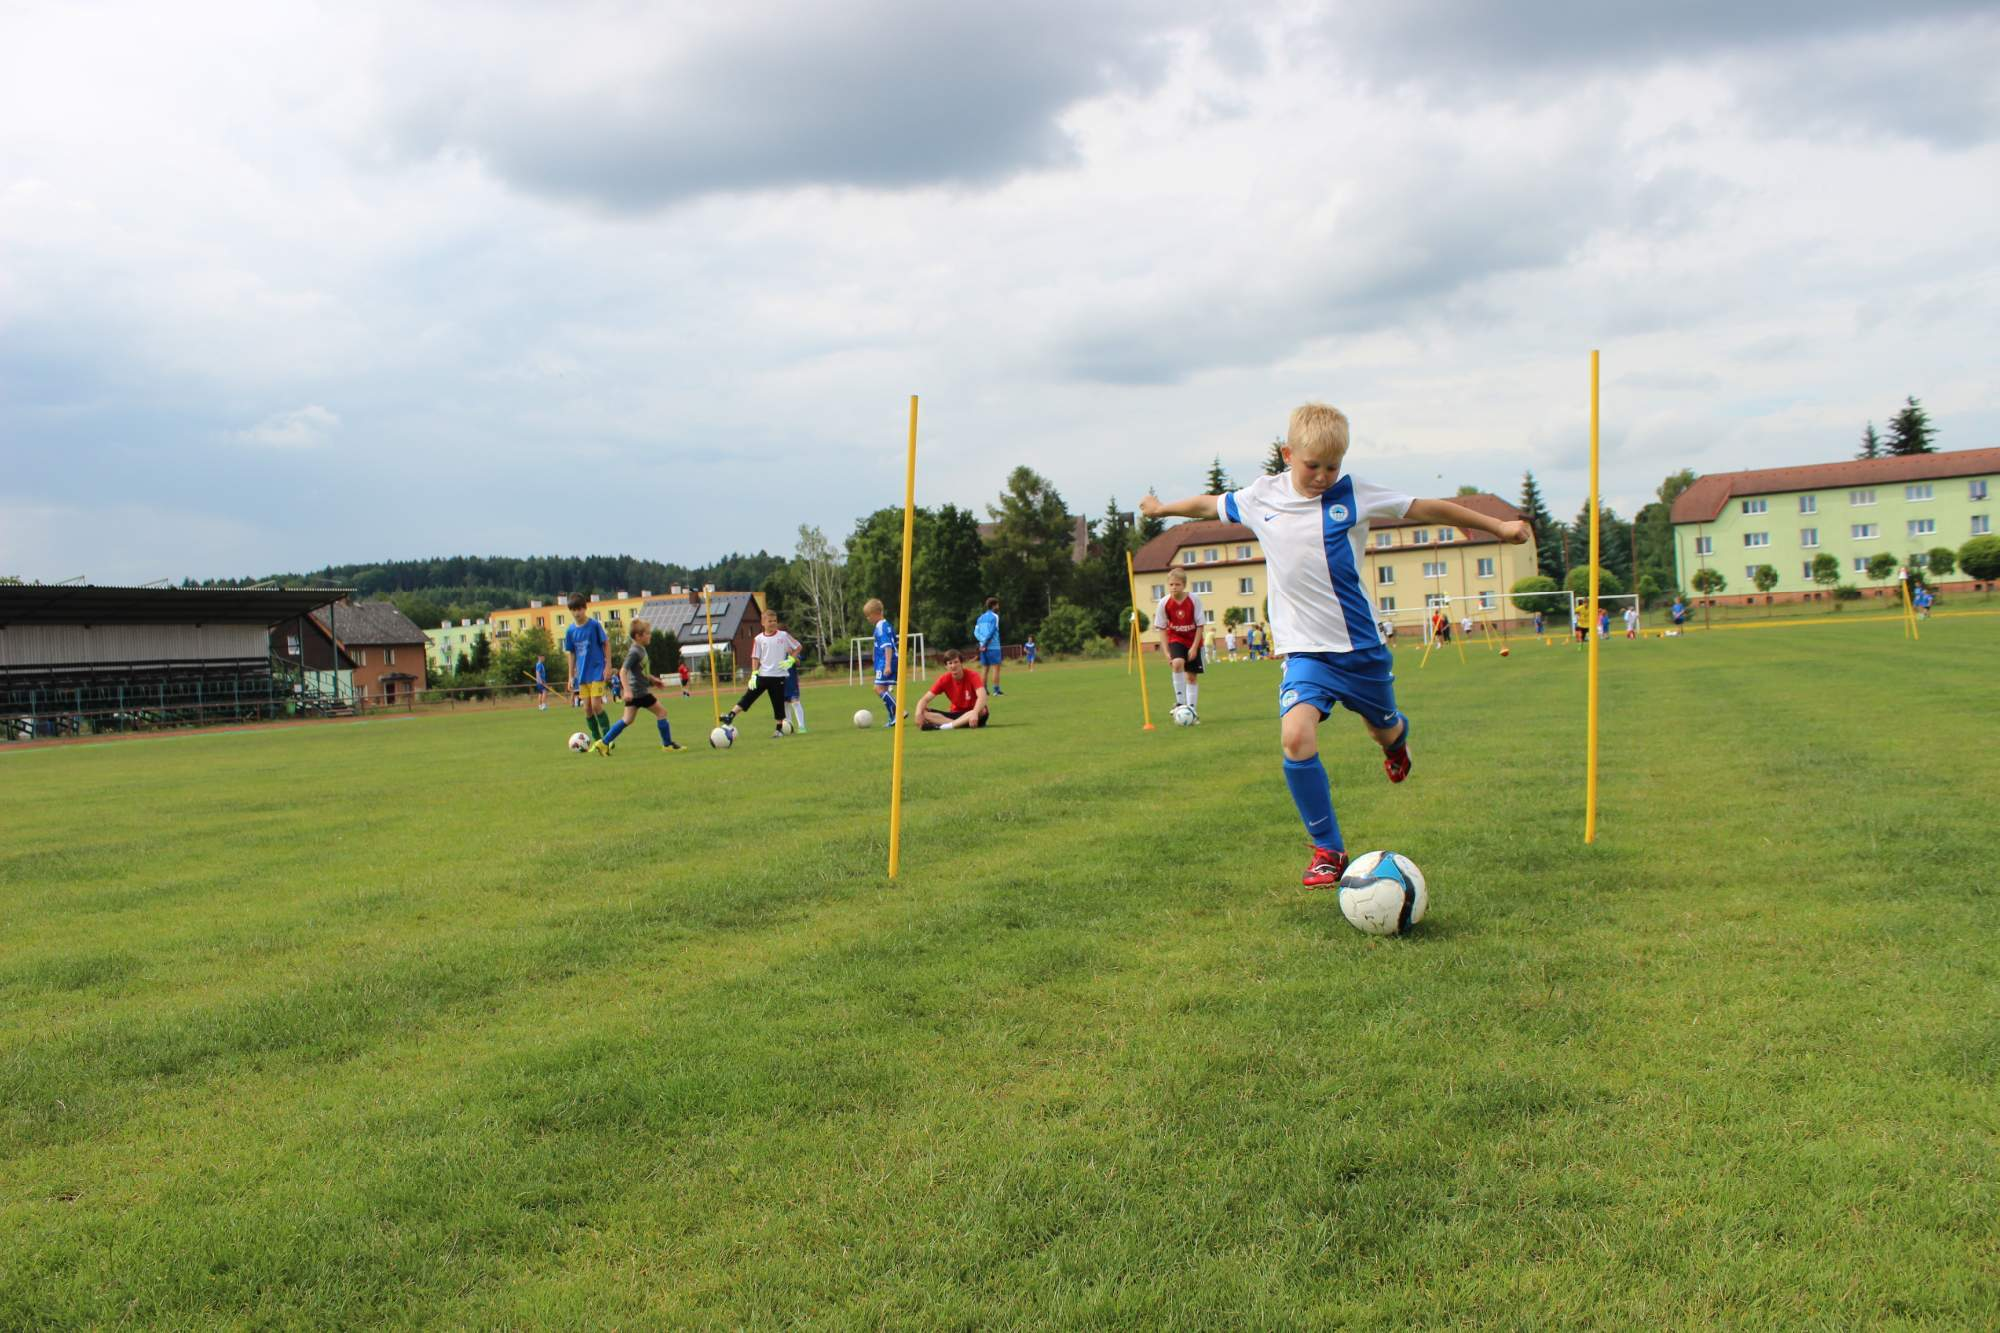 Fotbalové prázdniny Fotbalový kemp Fotbalové Prázdniny 2014 Střelbička